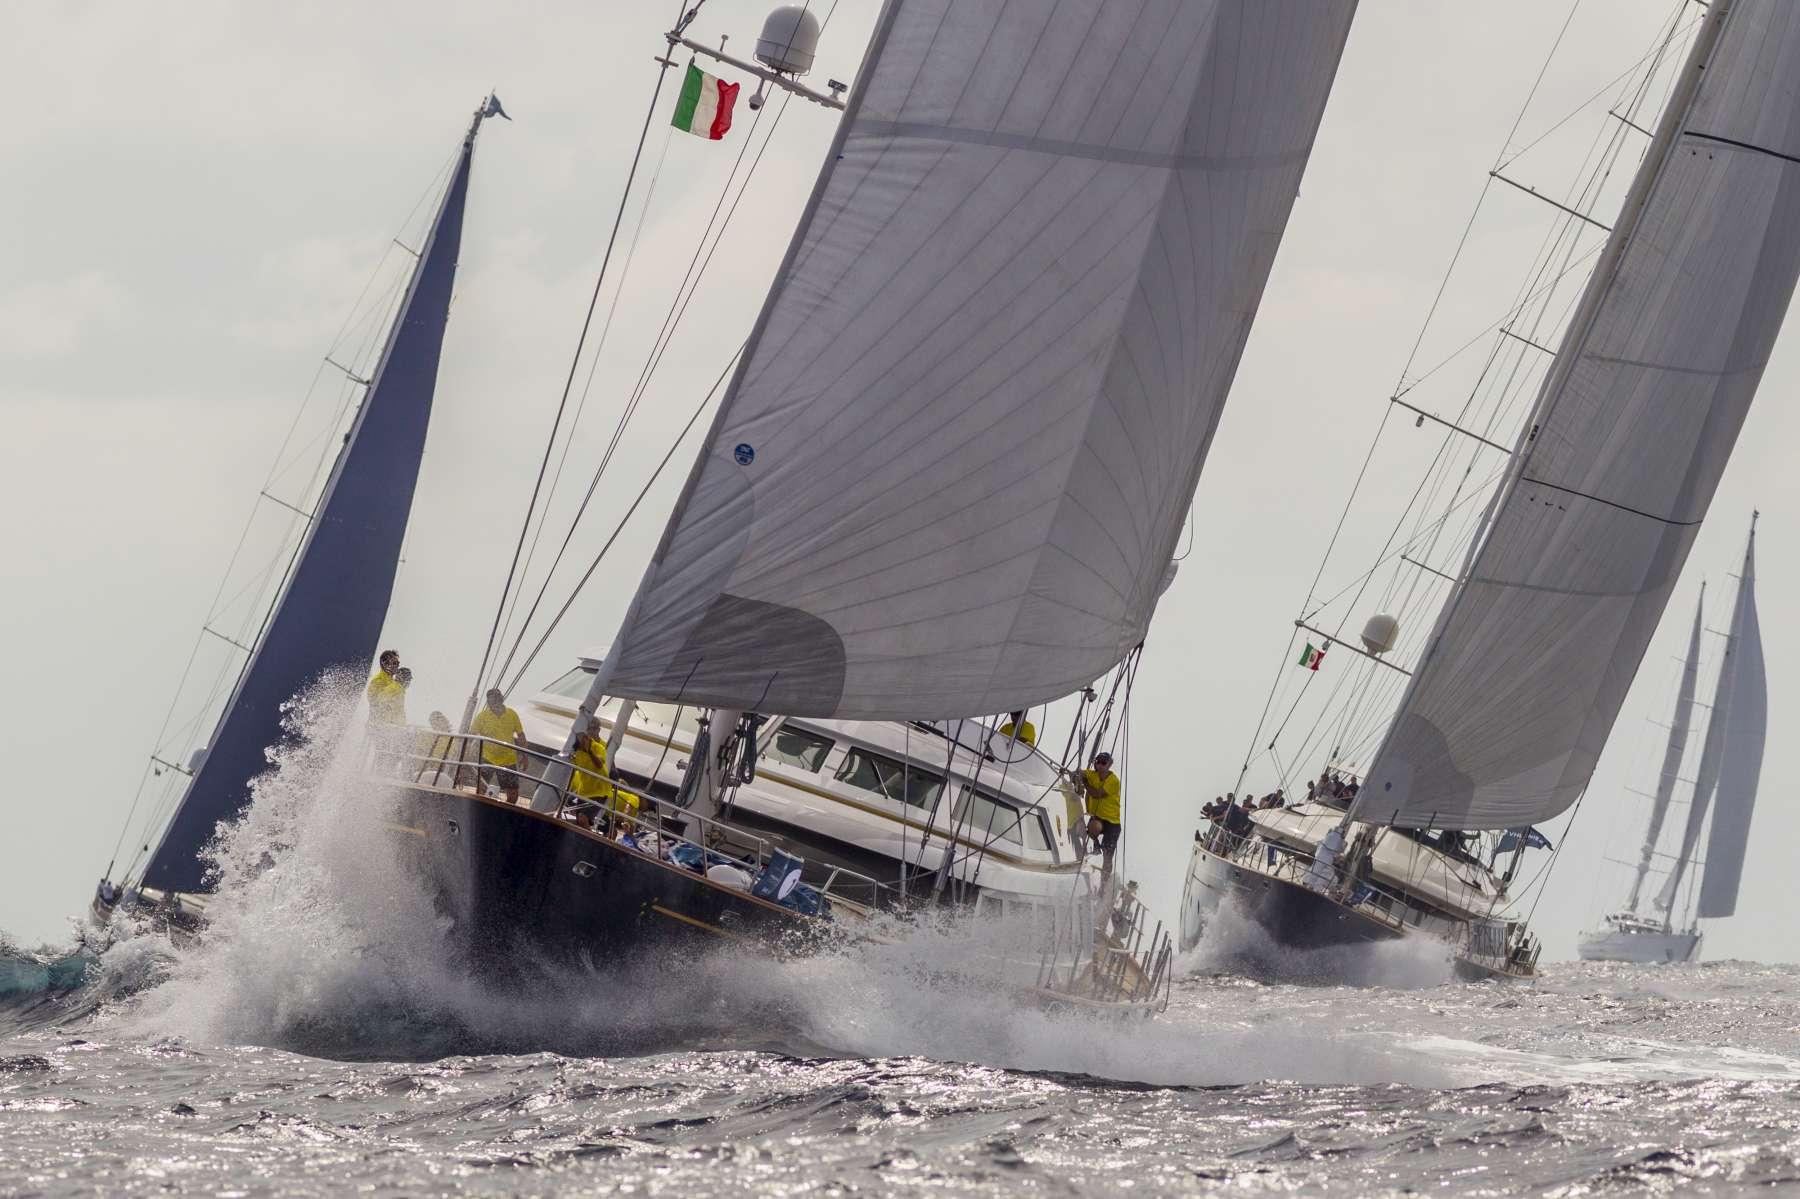 Perini Navi Cup: Silencio and Maltese Falcon winners of the day in Cruiser Racer and Corinthians Spirit classes respectively - NEWS - Yacht Club Costa Smeralda